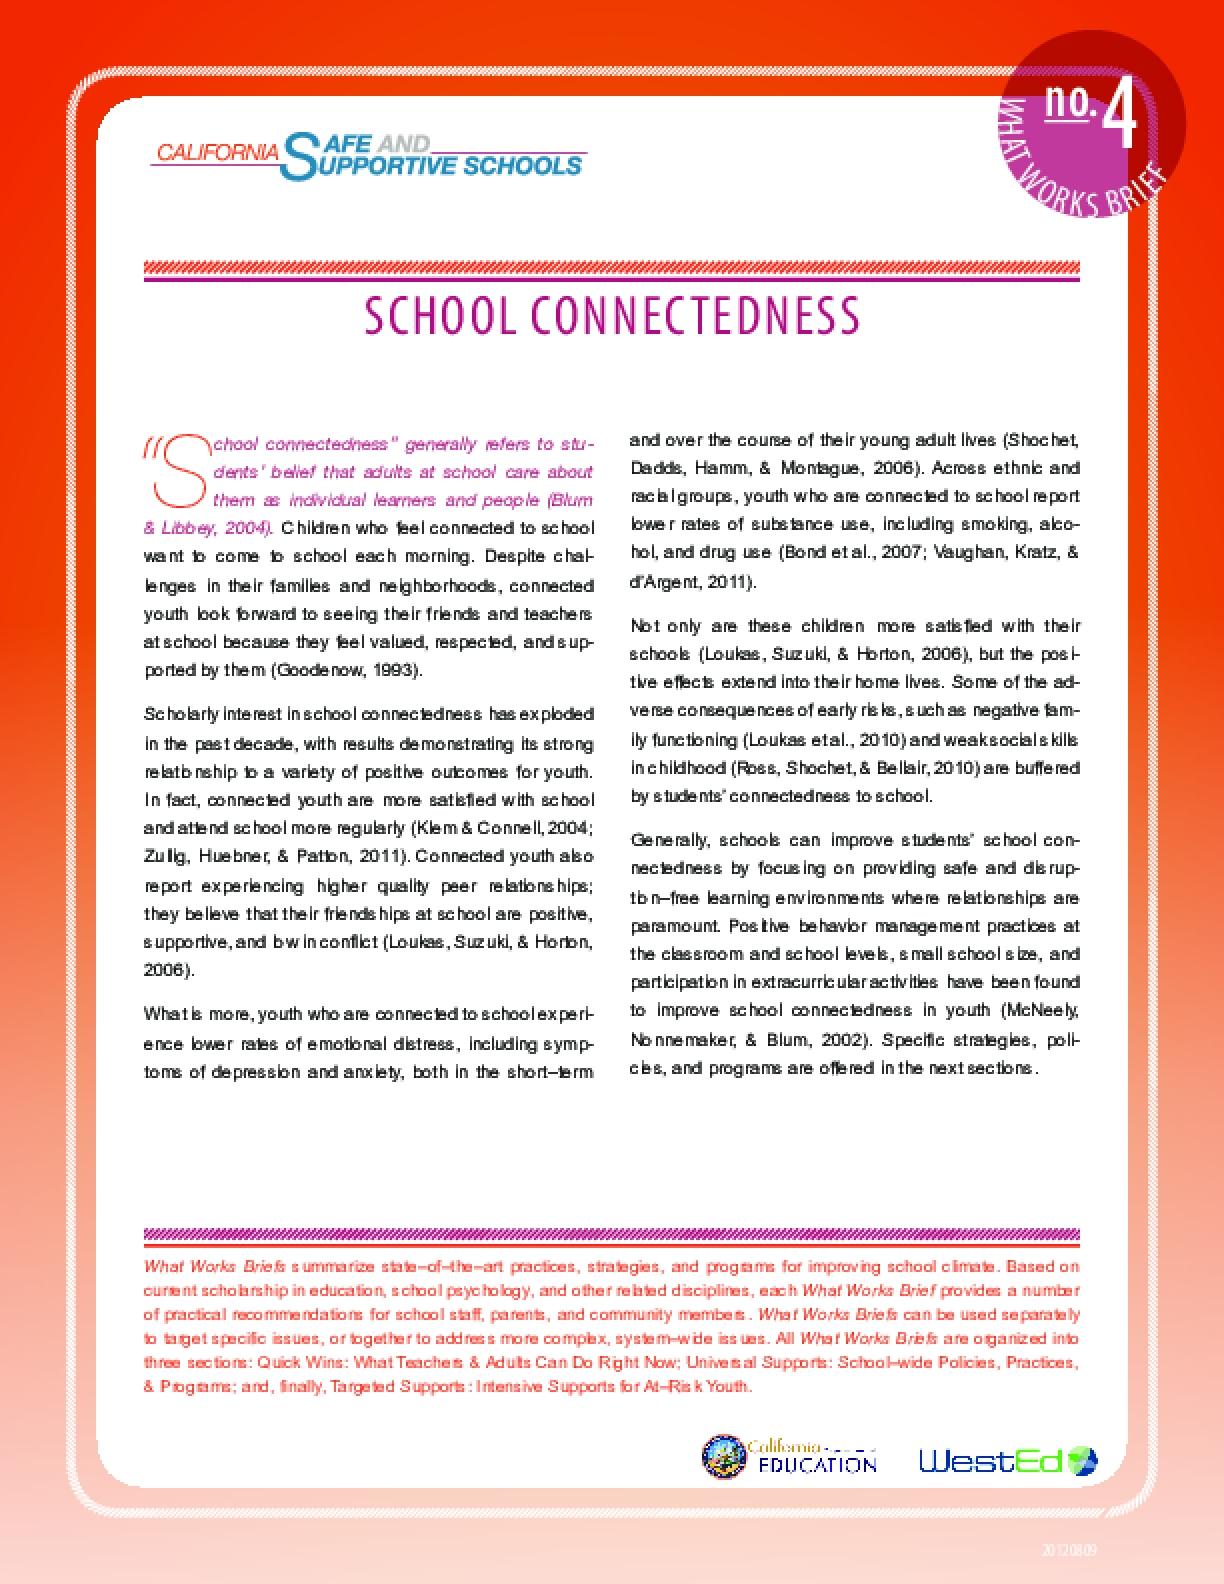 What Works Brief #4: School Connectedness